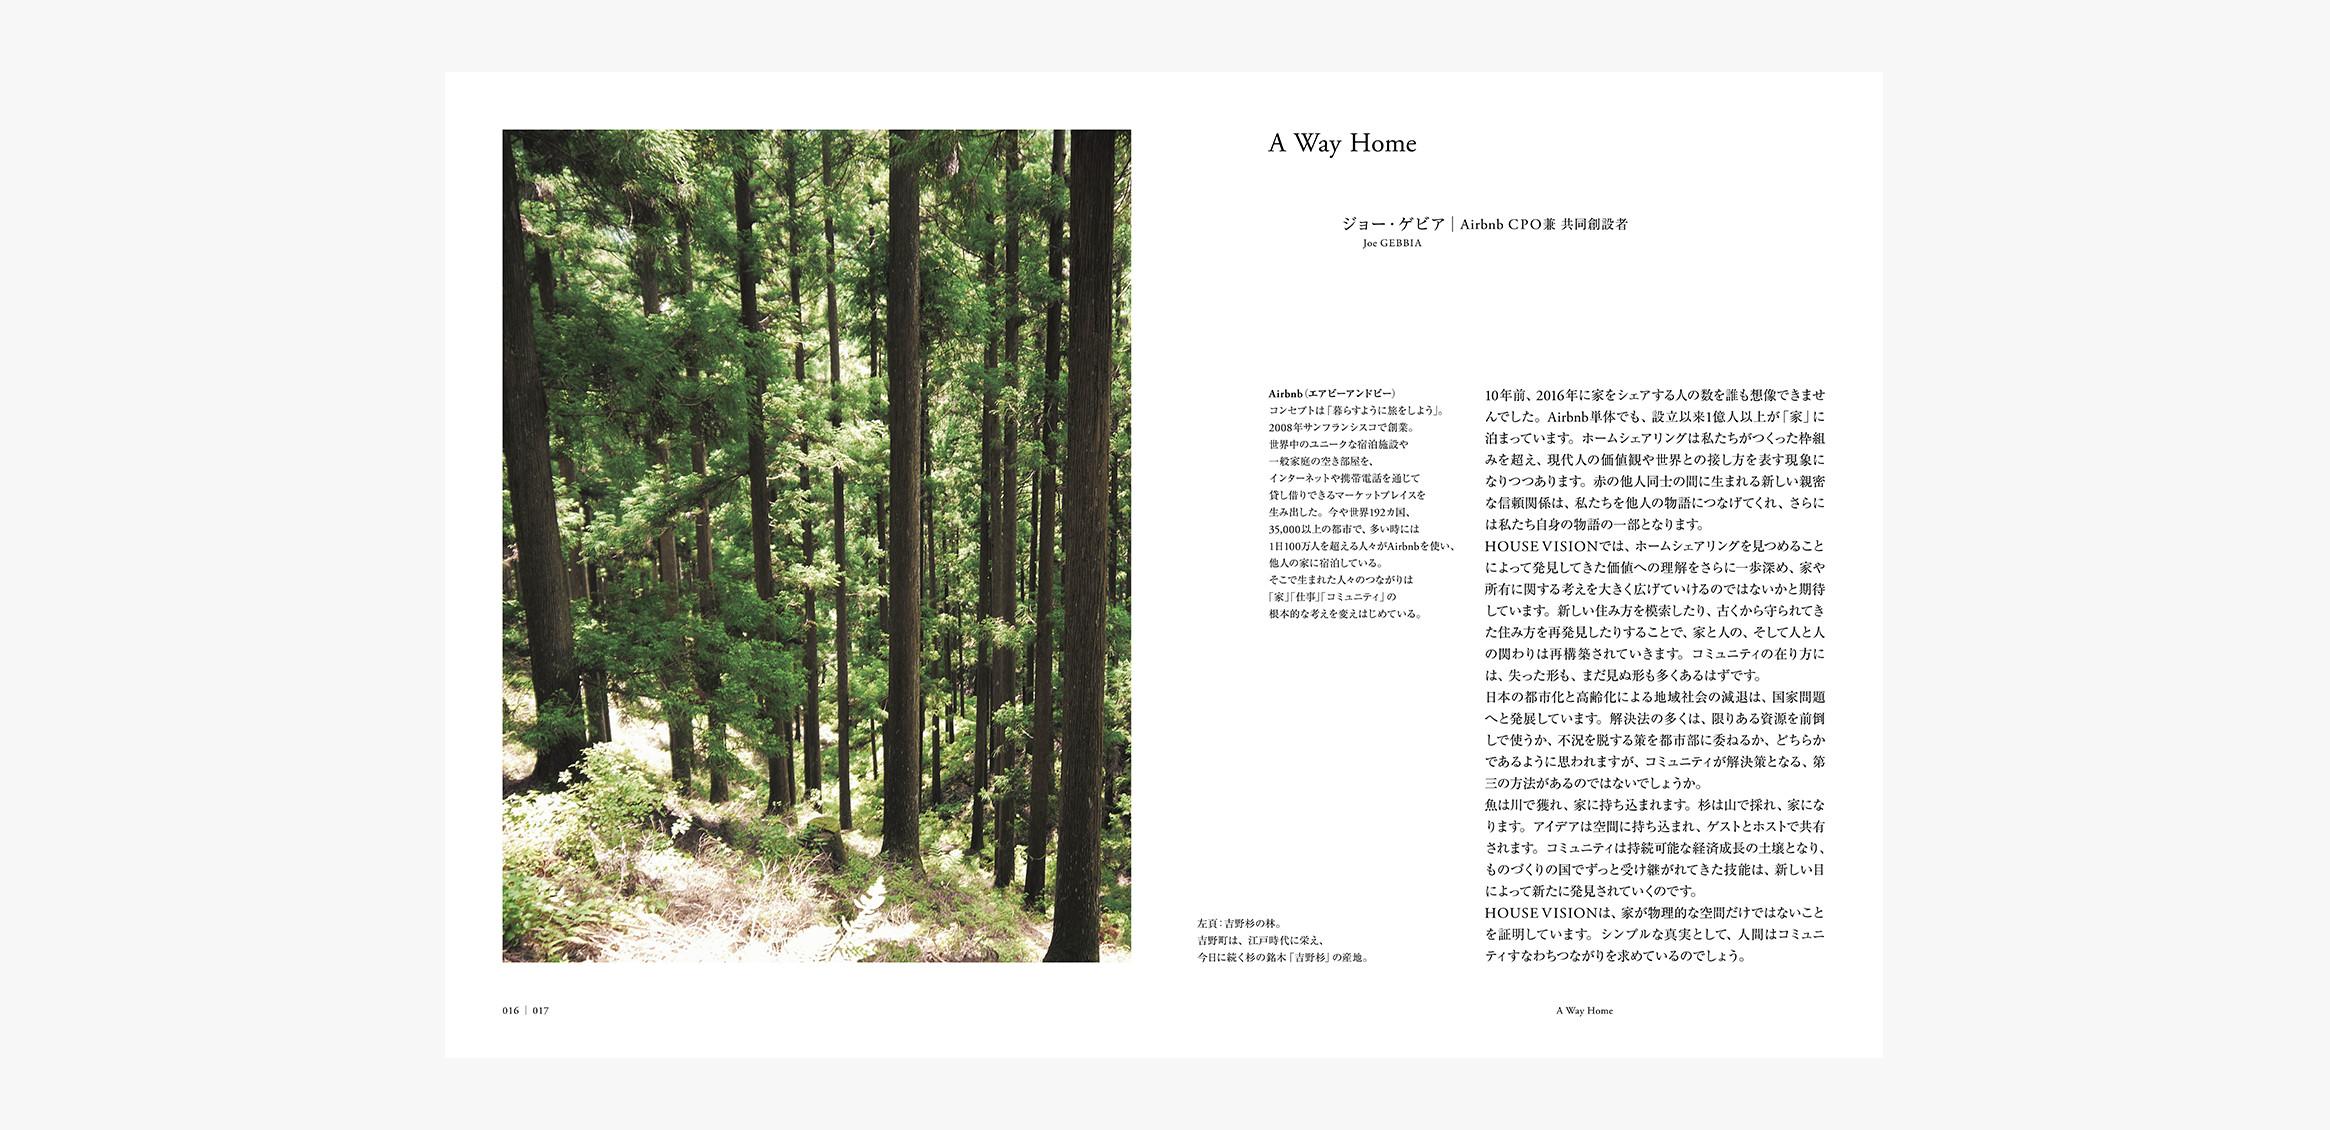 HOUSE VISION 2 2016 TOKYO EXHIBITION4枚目